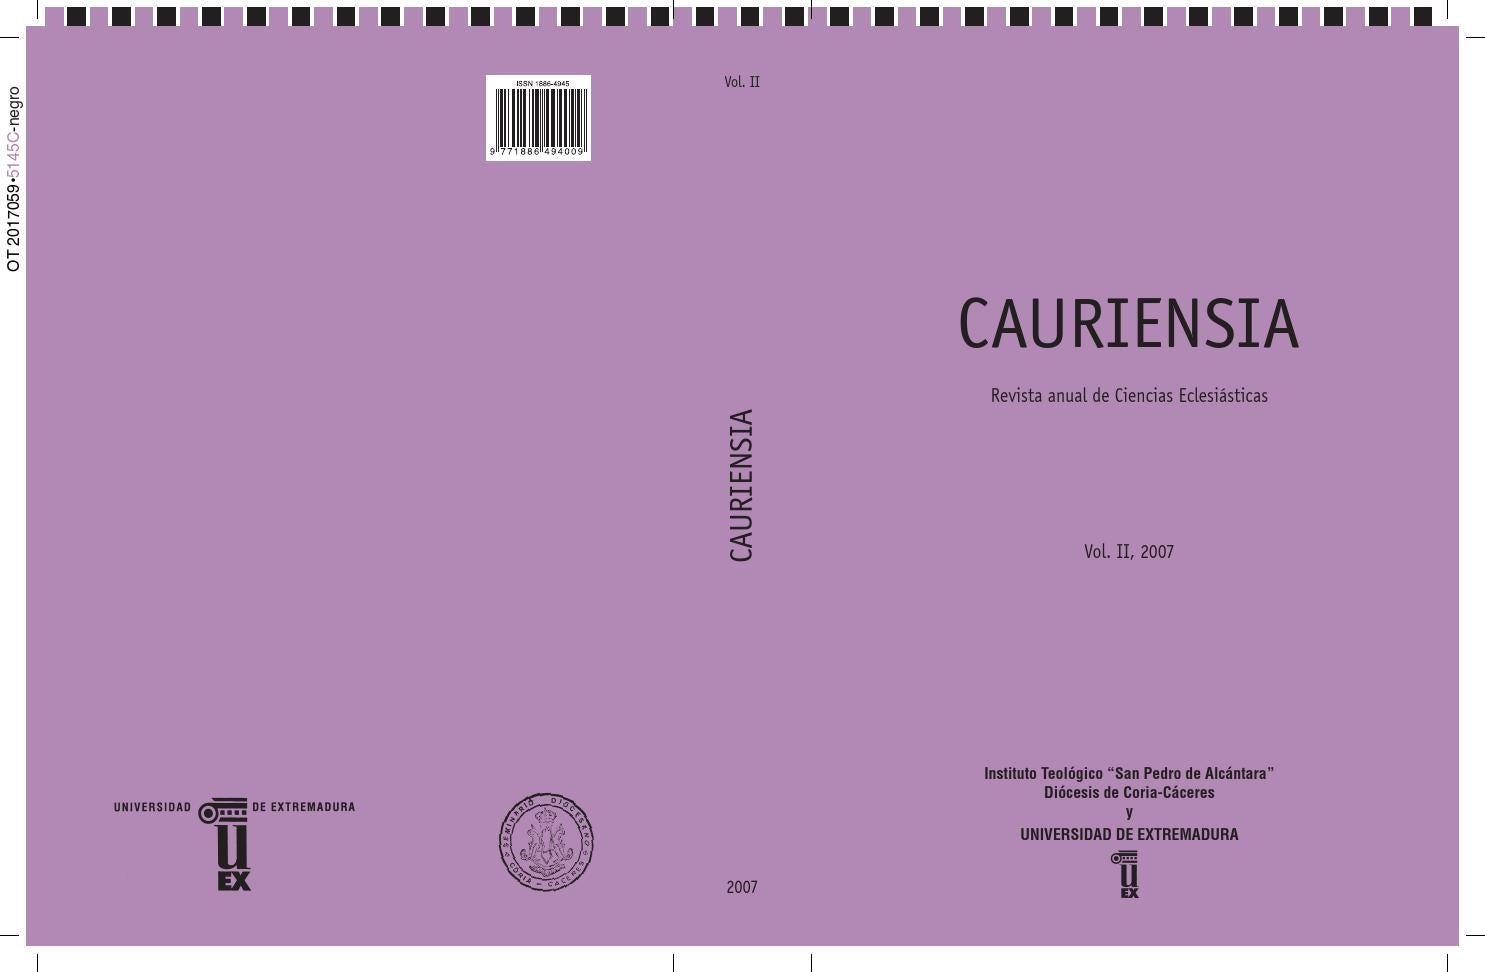 Cauriensia II part 1 by Boletín_Publicaciones - issuu